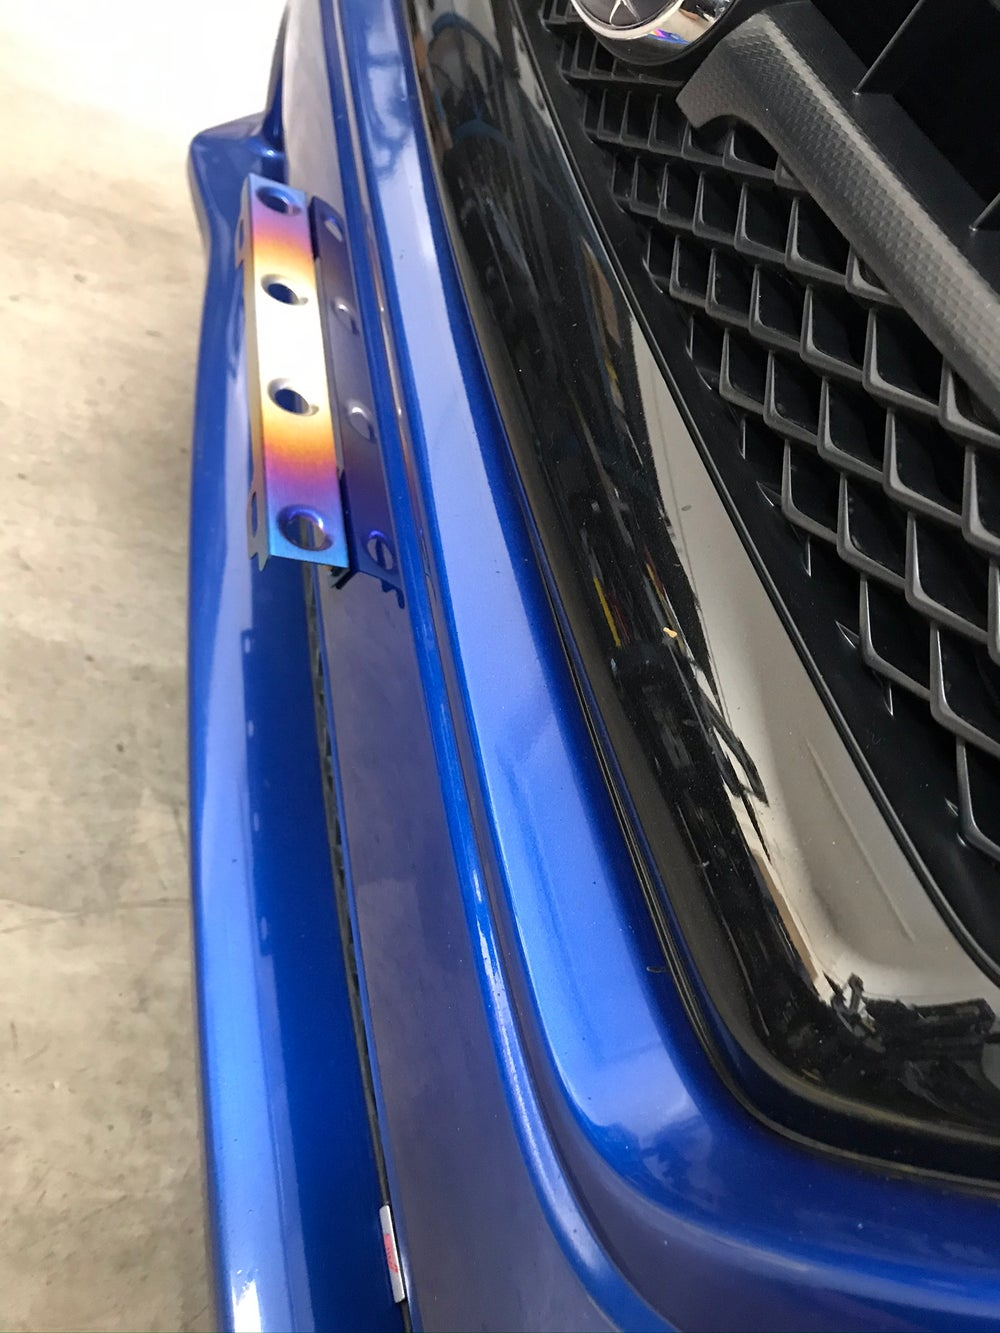 Subaru 2015+  titanium front mount license plate bracket kit